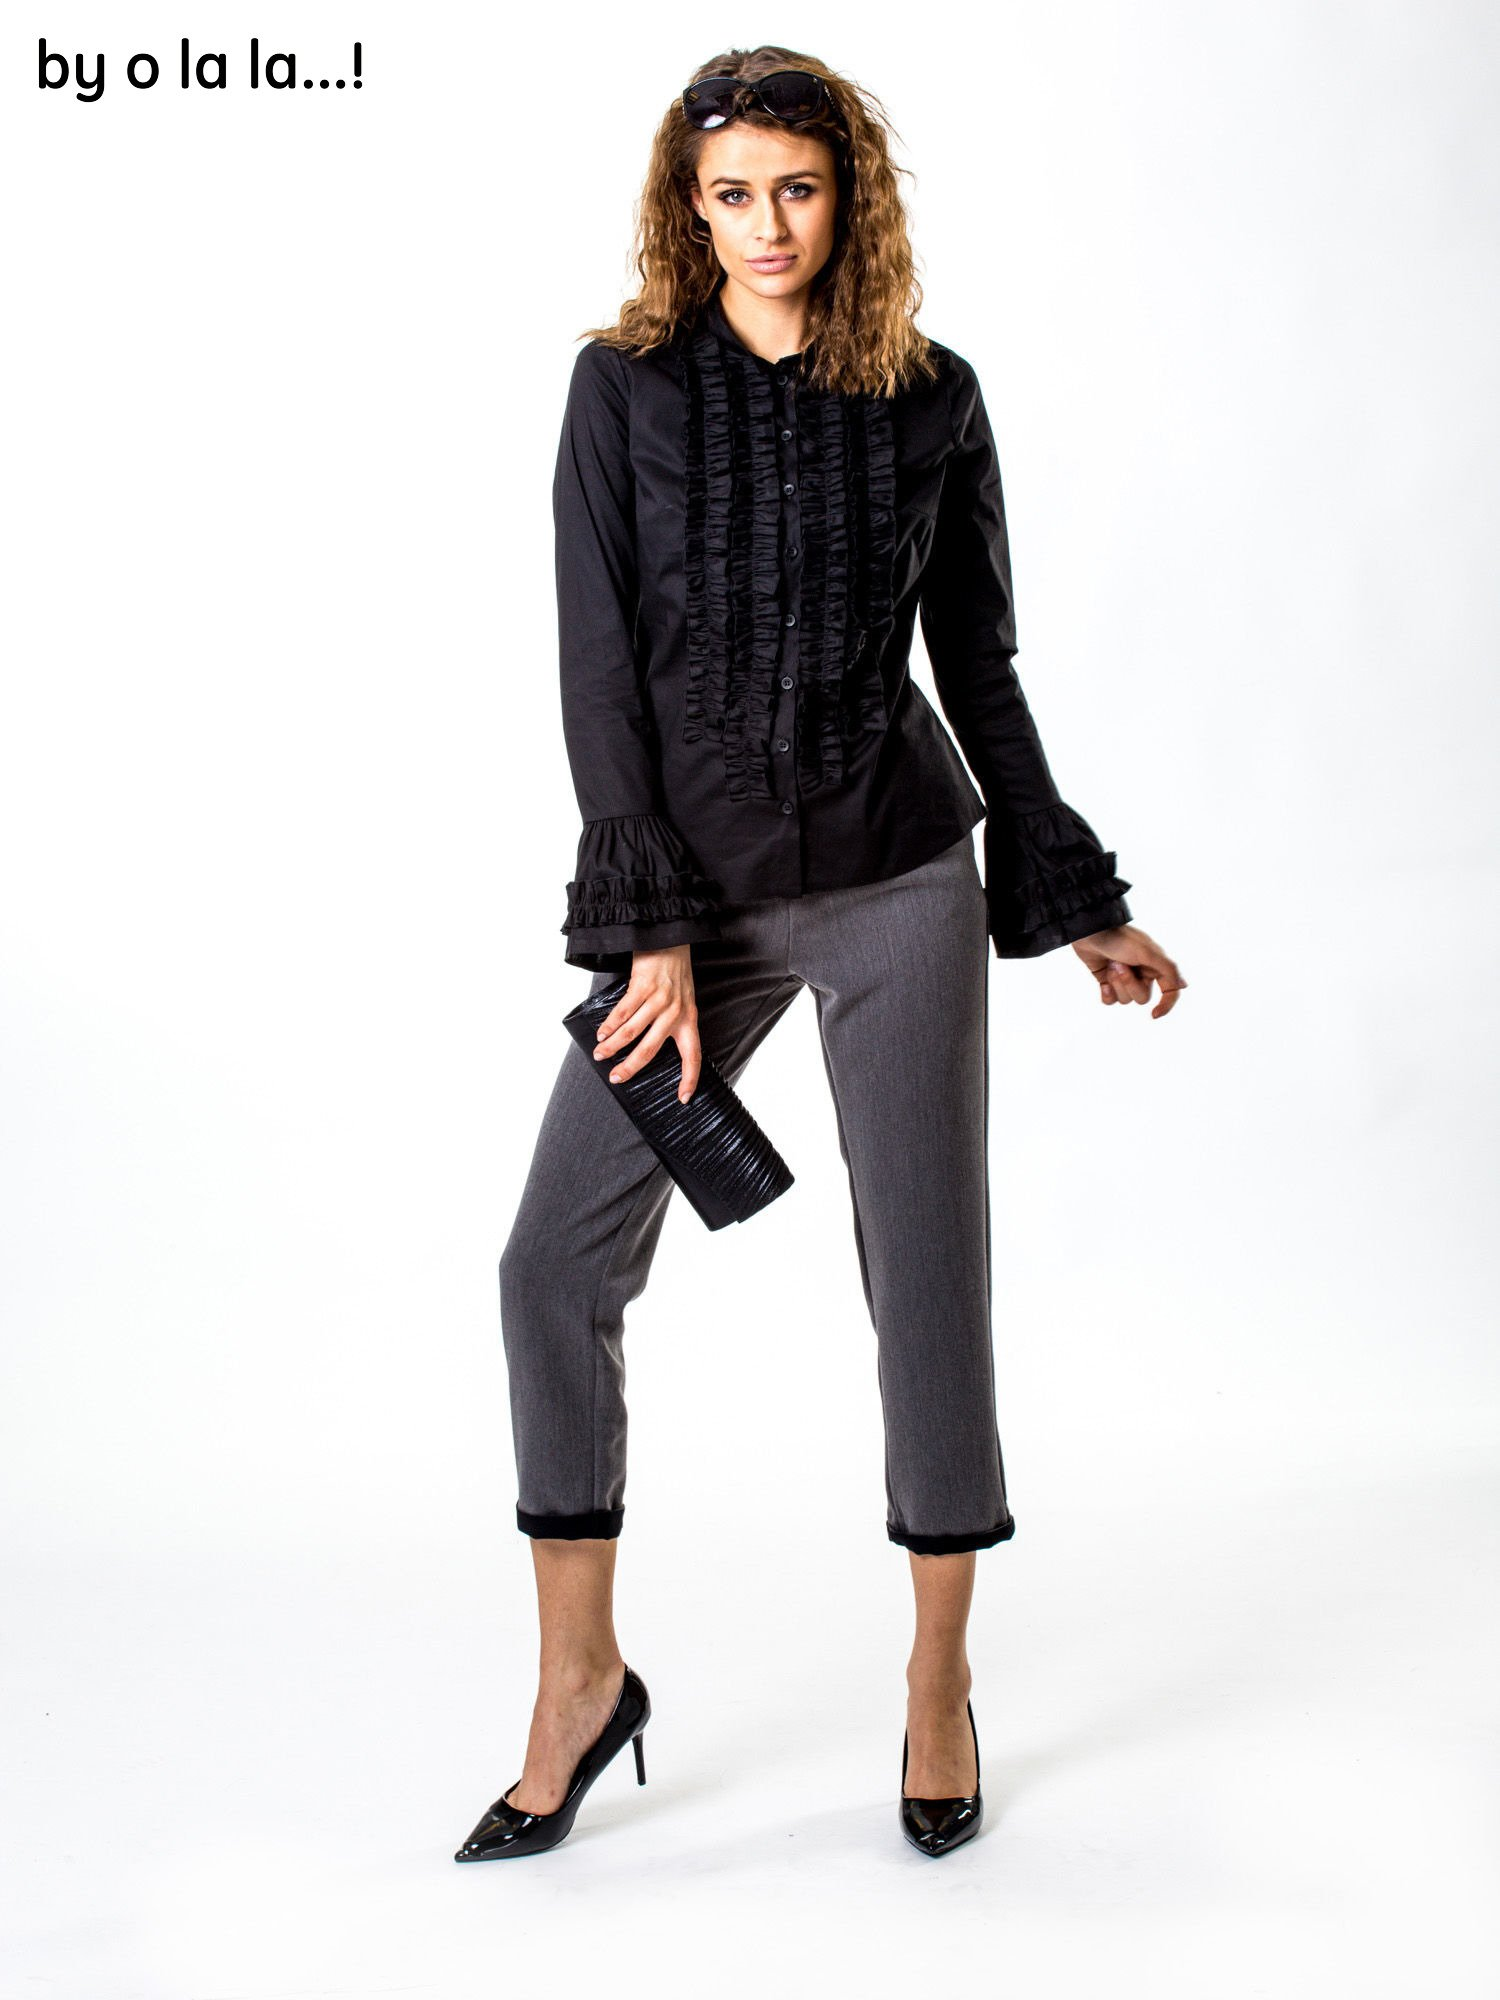 8d7154257becae Czarna koszula z żabotem BY O LA LA - Koszula klasyczna - sklep ...